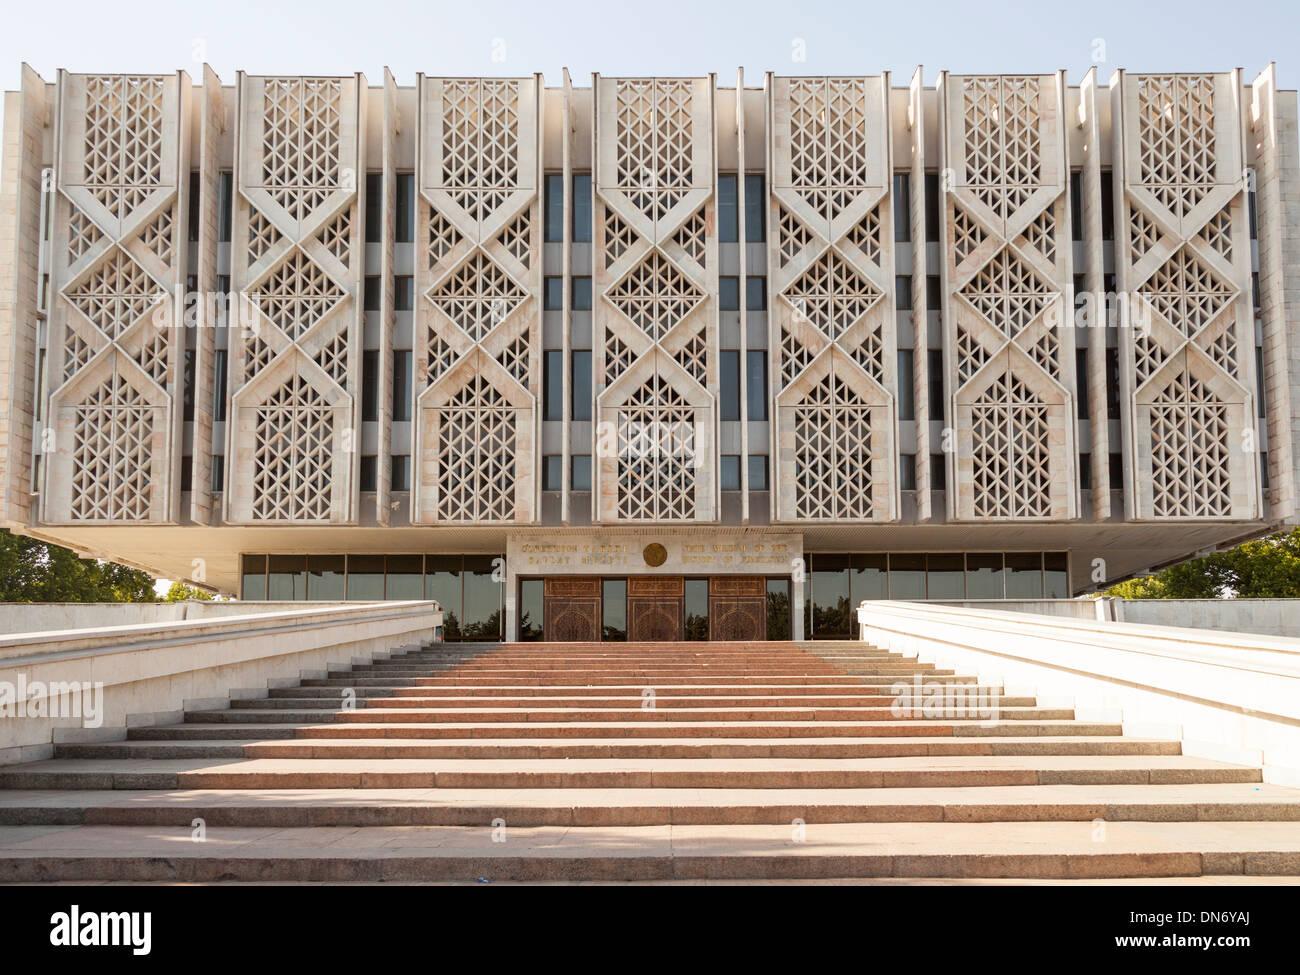 State Museum Of The History Of Uzbekistan Tashkent Uzbekistan Stock Photo Alamy